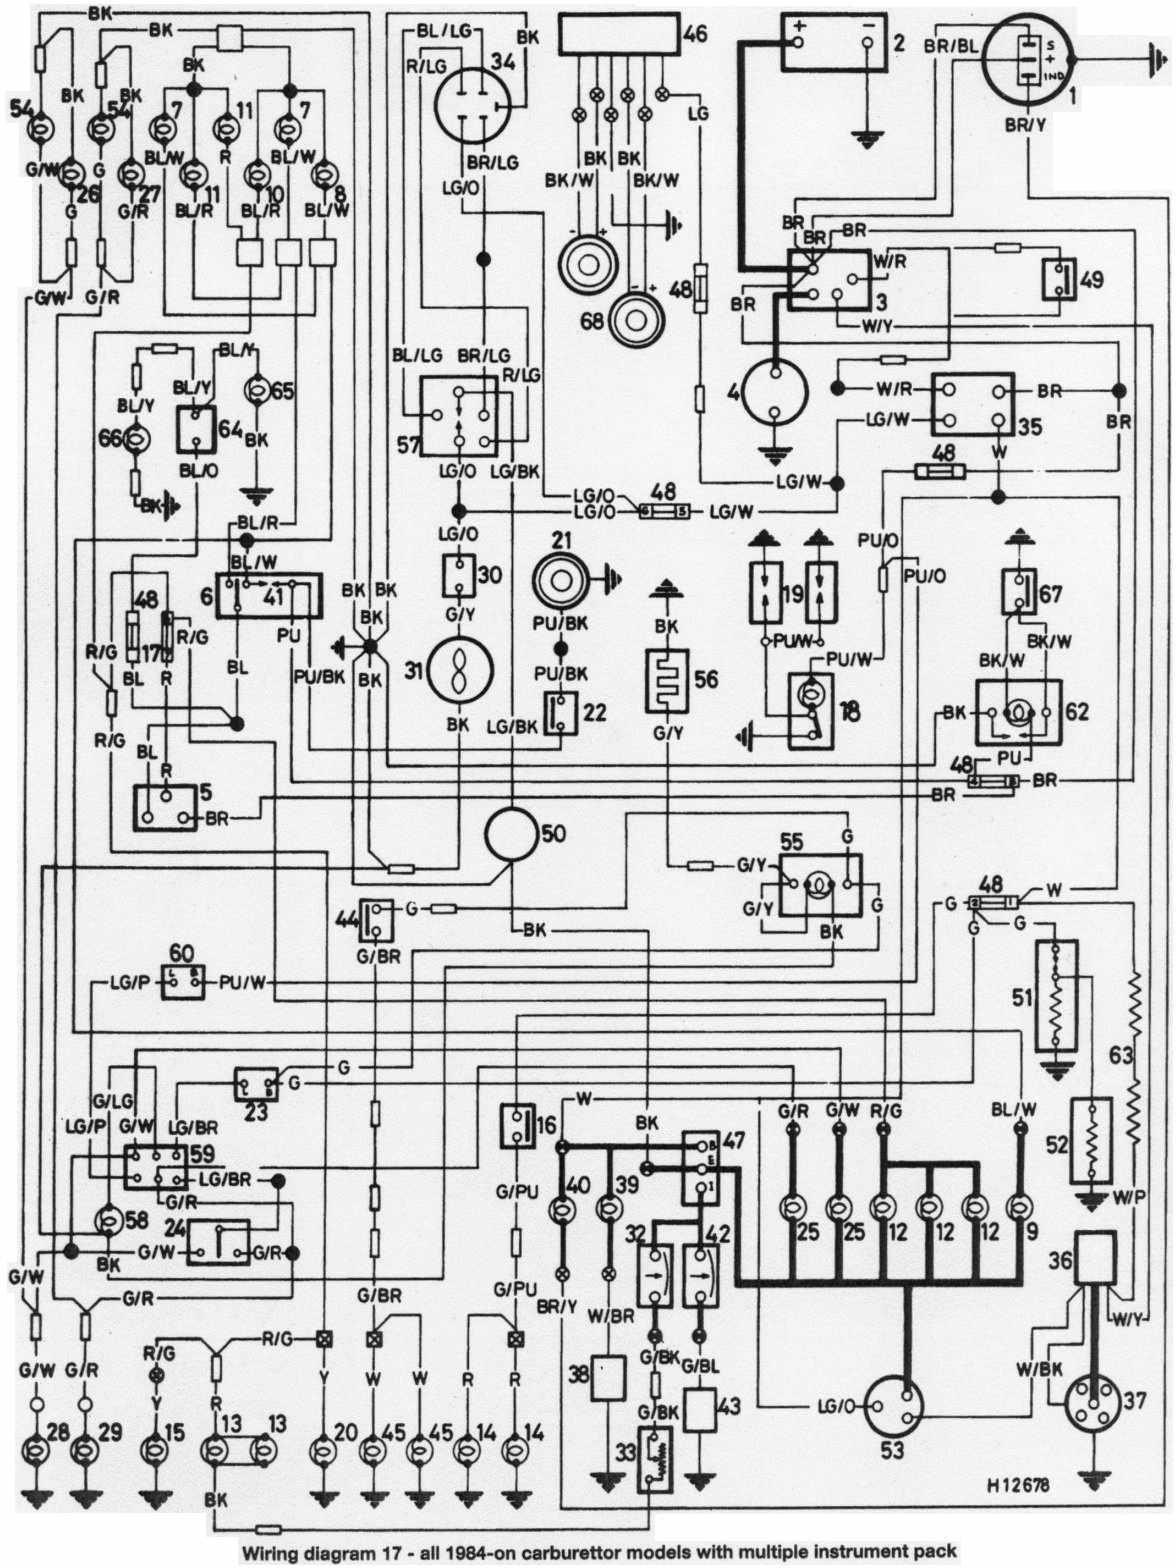 wiring diagram of 1984 onwards all mini series with multiple instrument pack?t\=1508499130 1992 mini wiring diagram wiring lights \u2022 wiring diagrams j mitsubishi mini truck wiring diagram at eliteediting.co